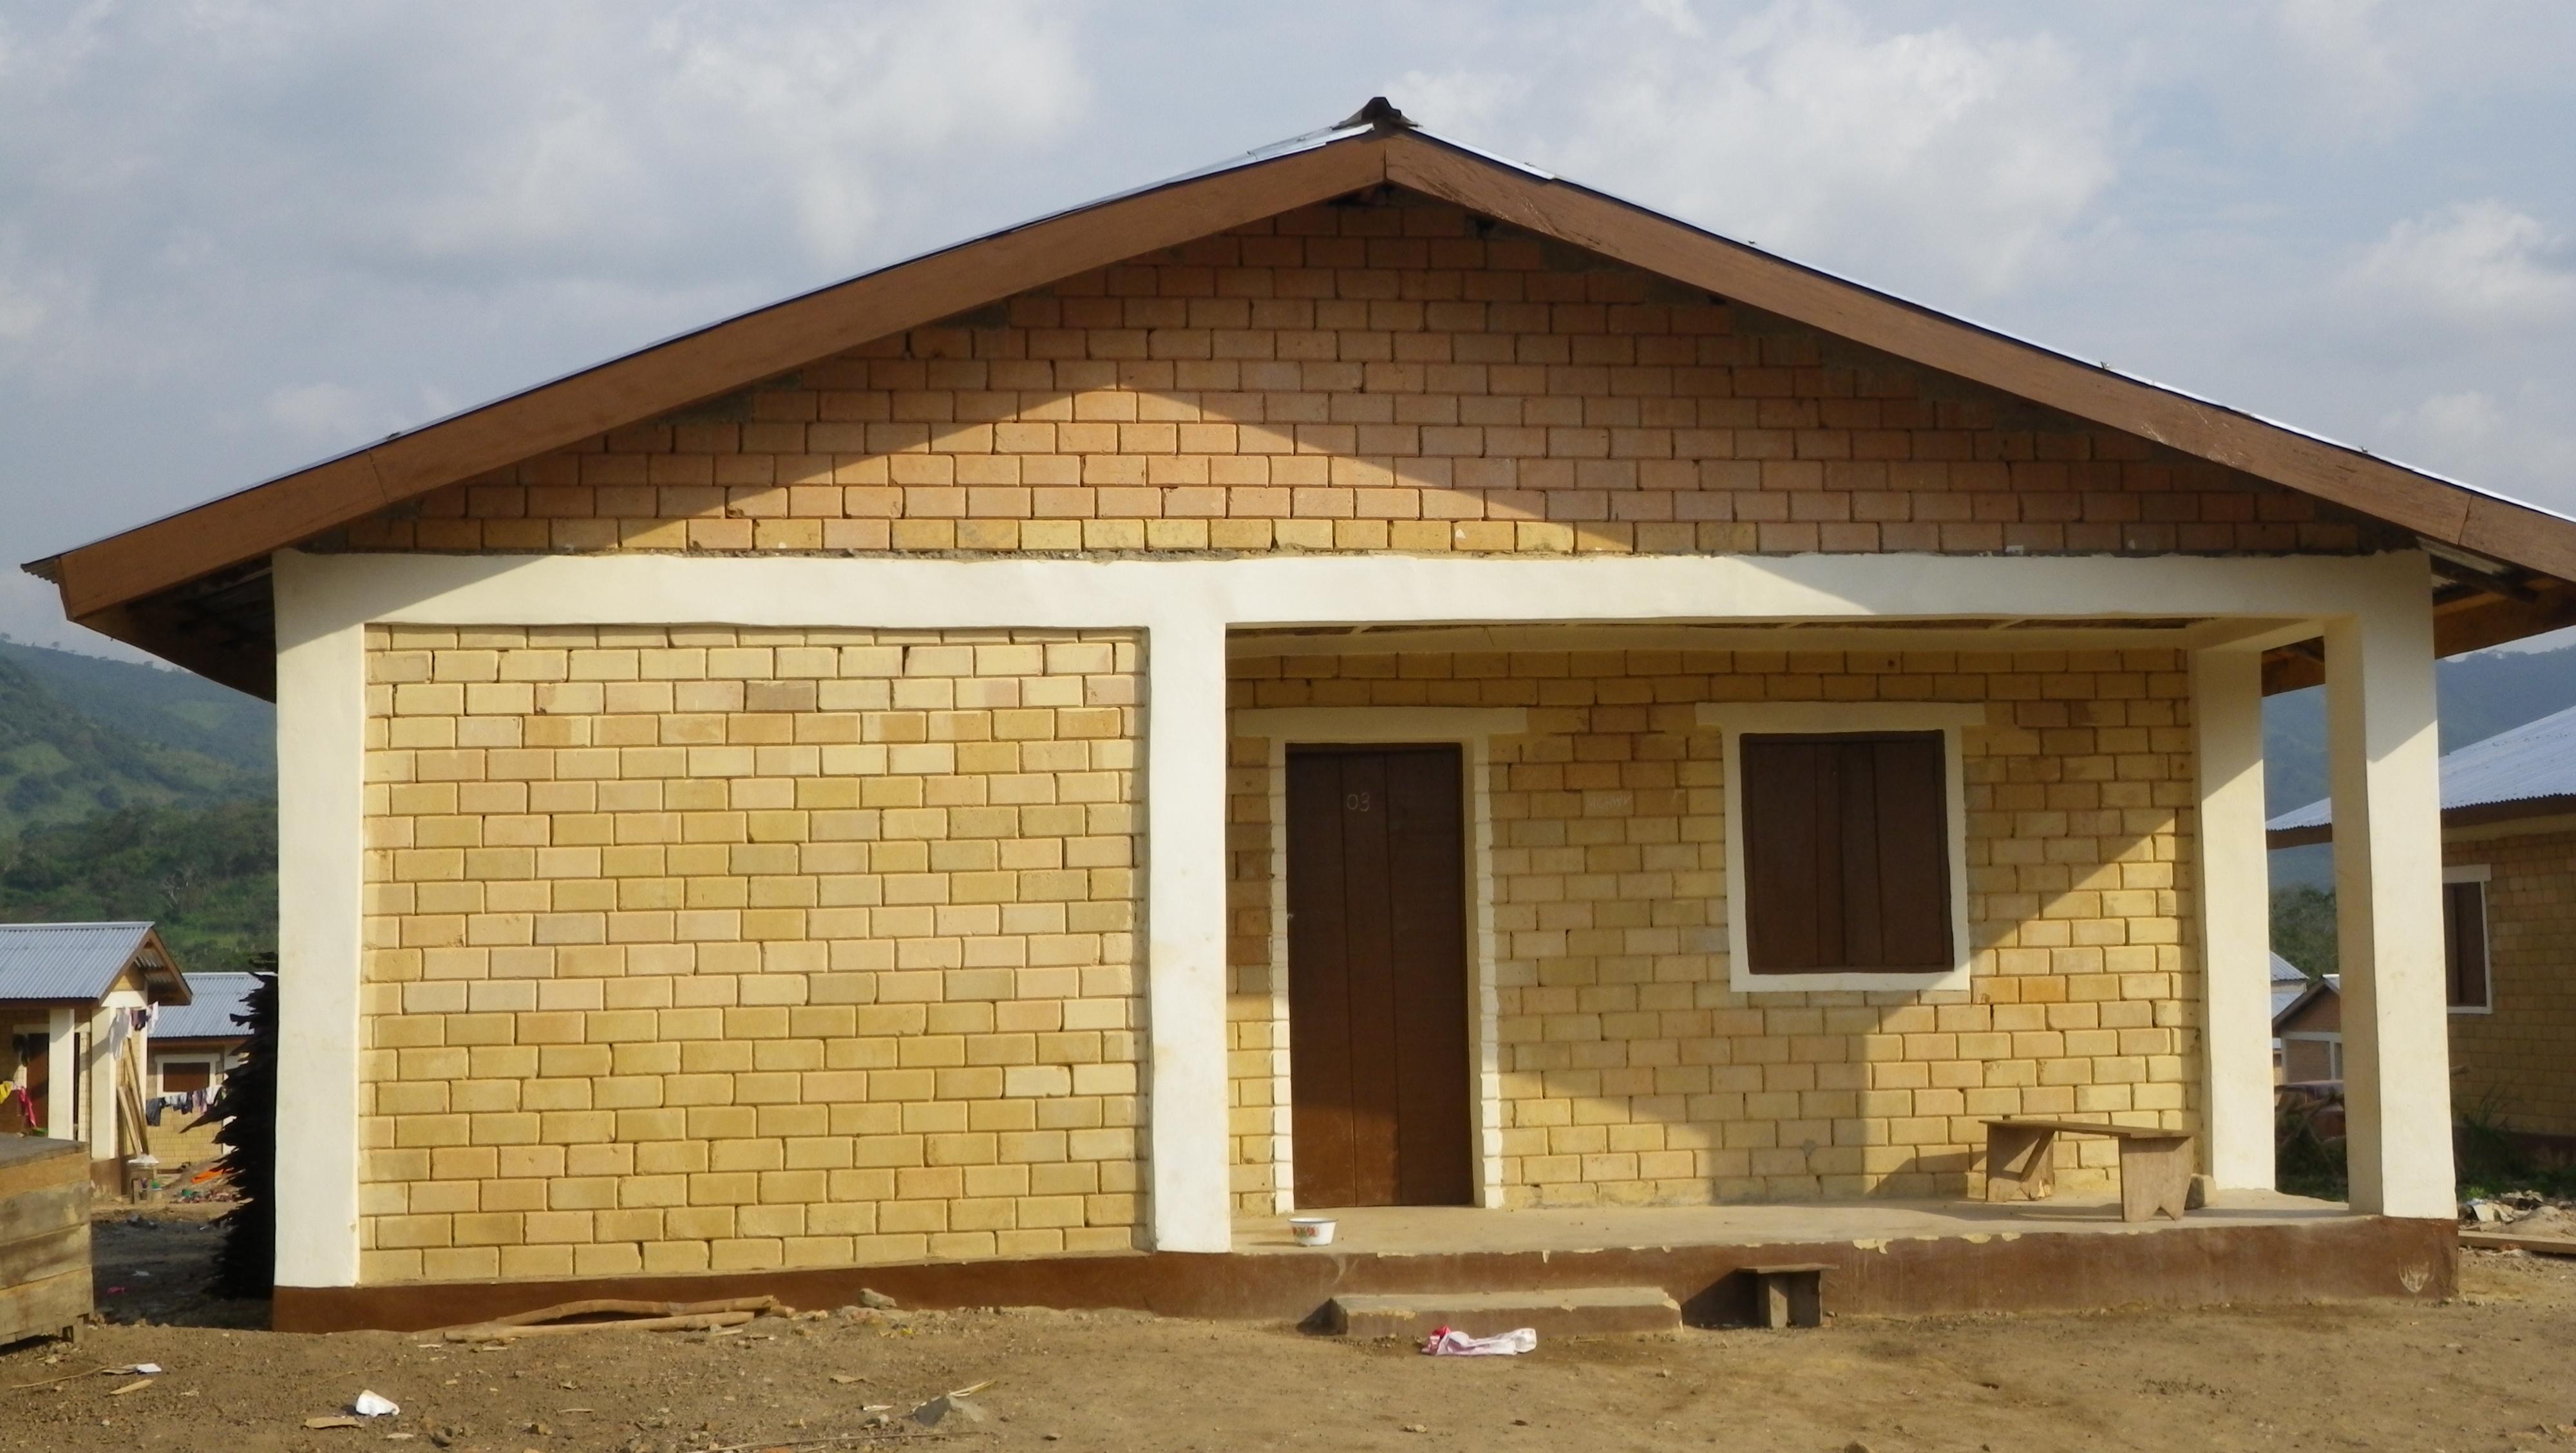 Resettlement housing